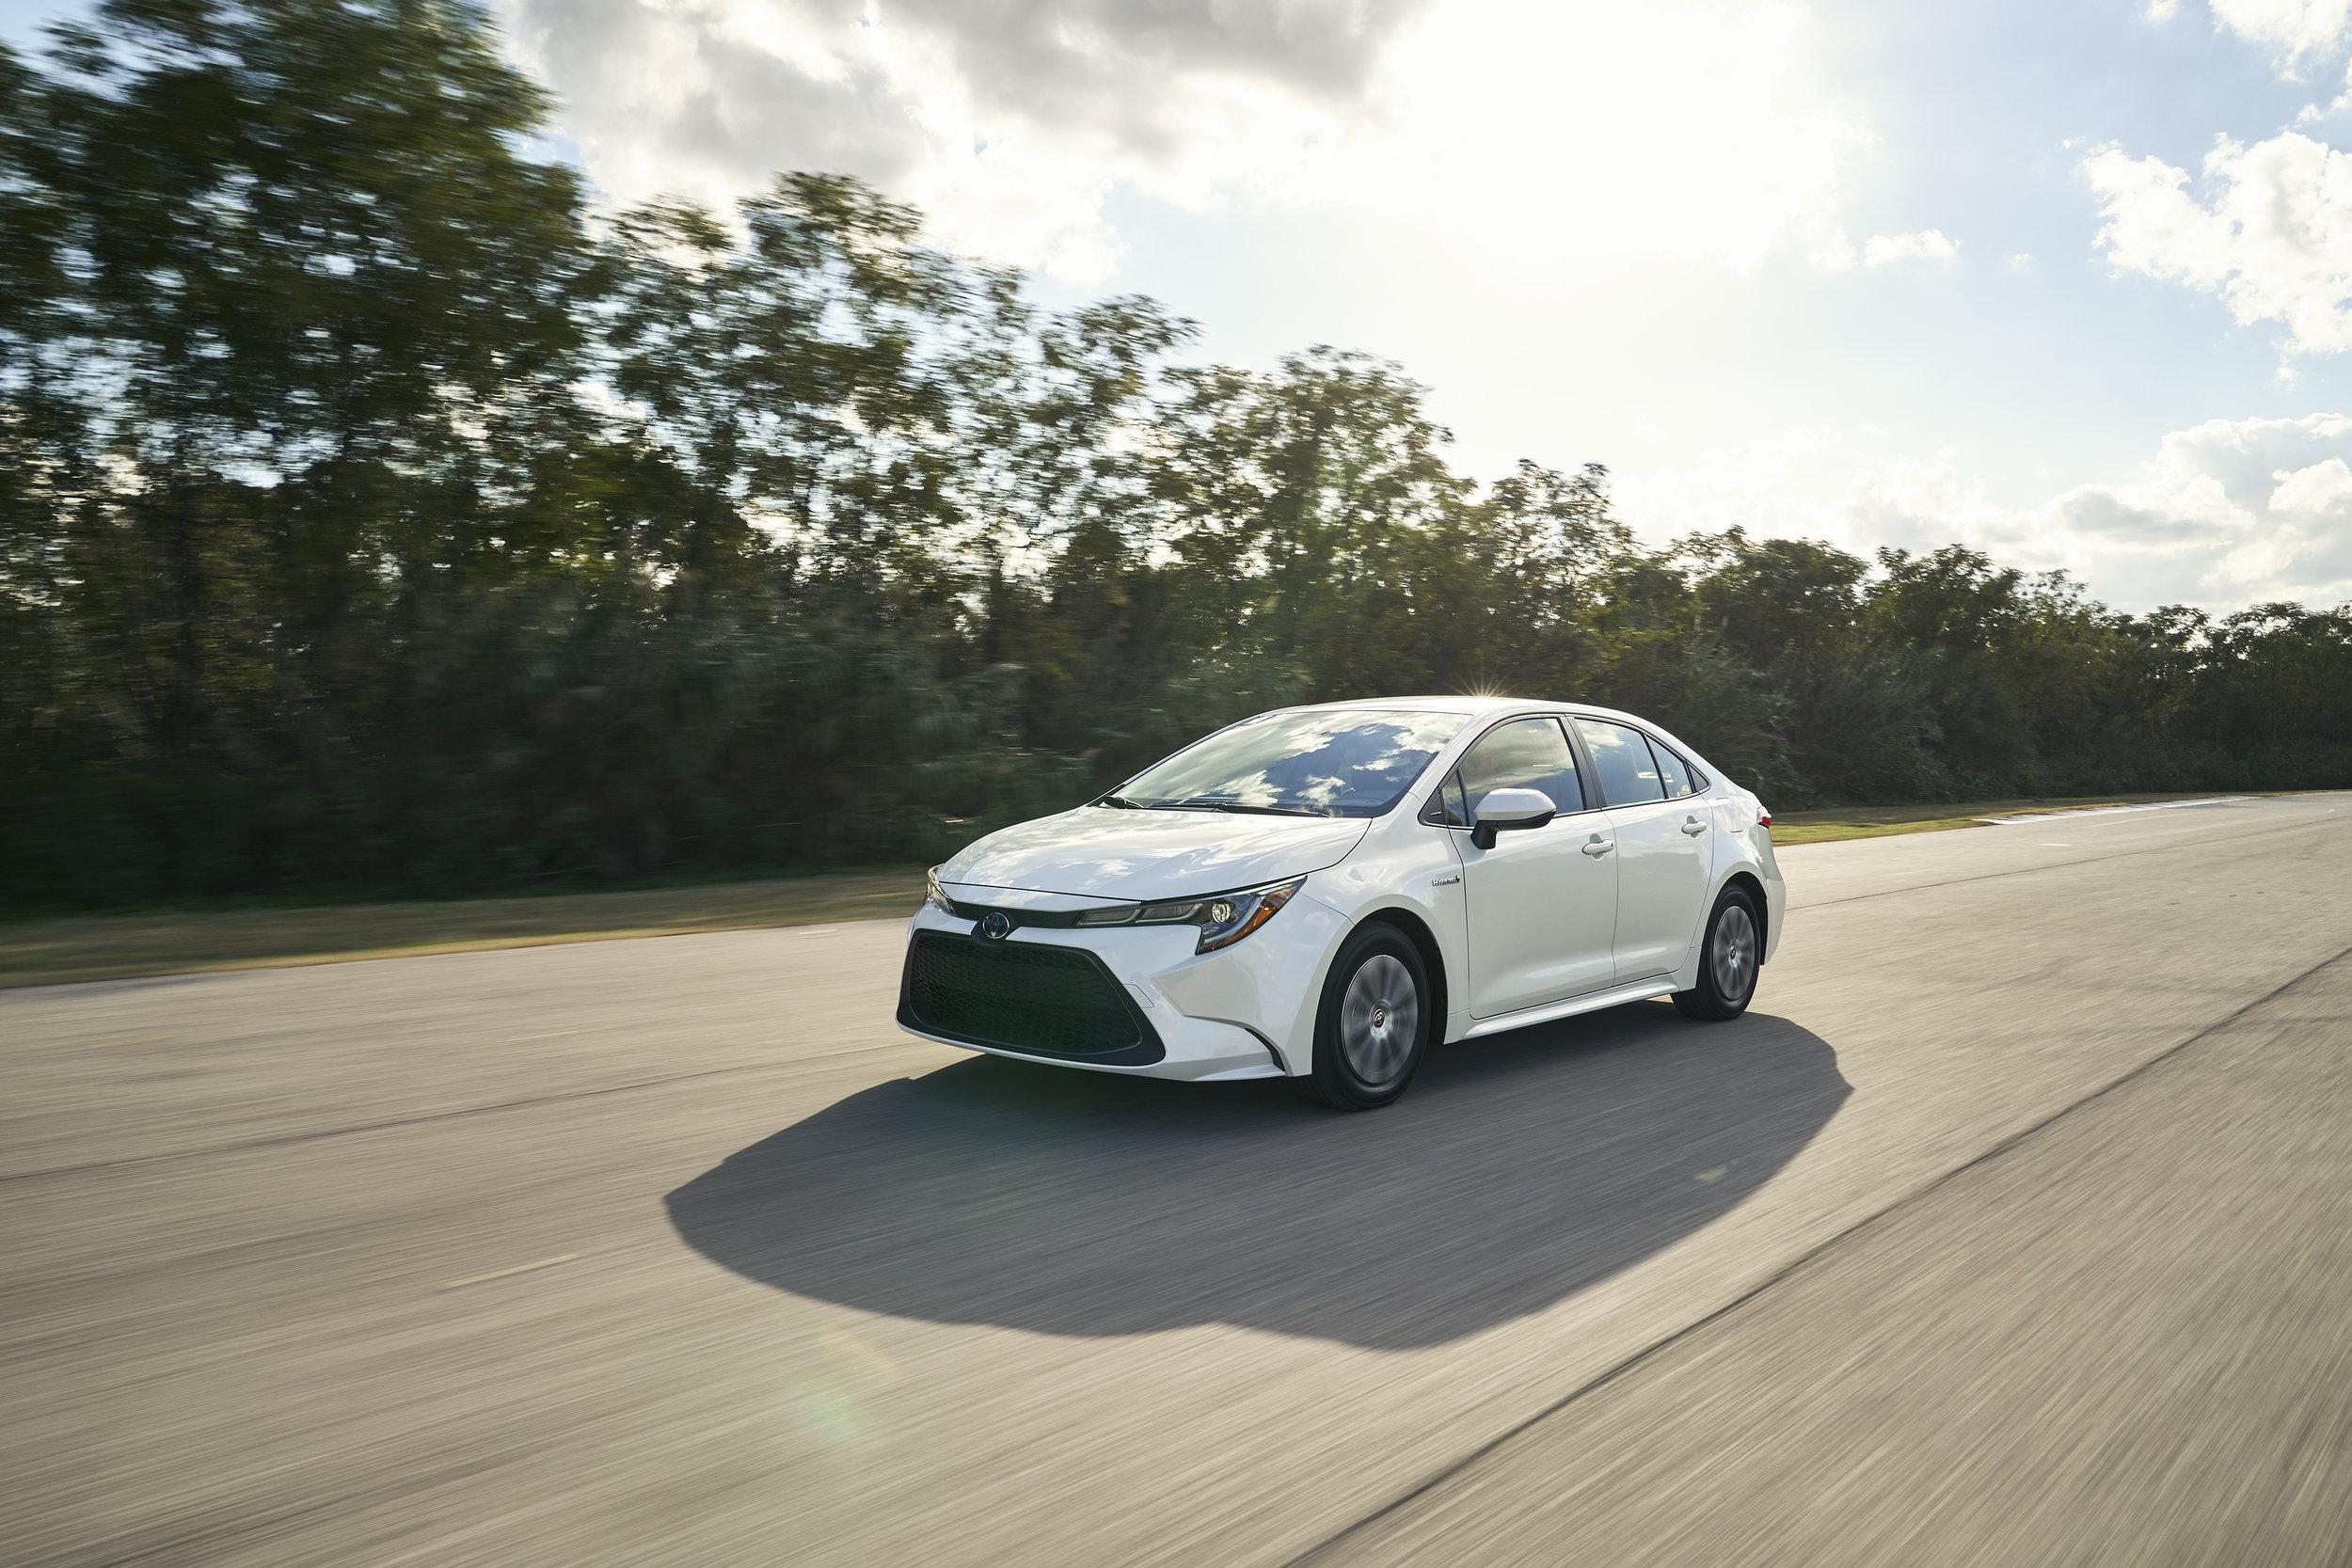 The 2020 Toyota Corolla hybrid